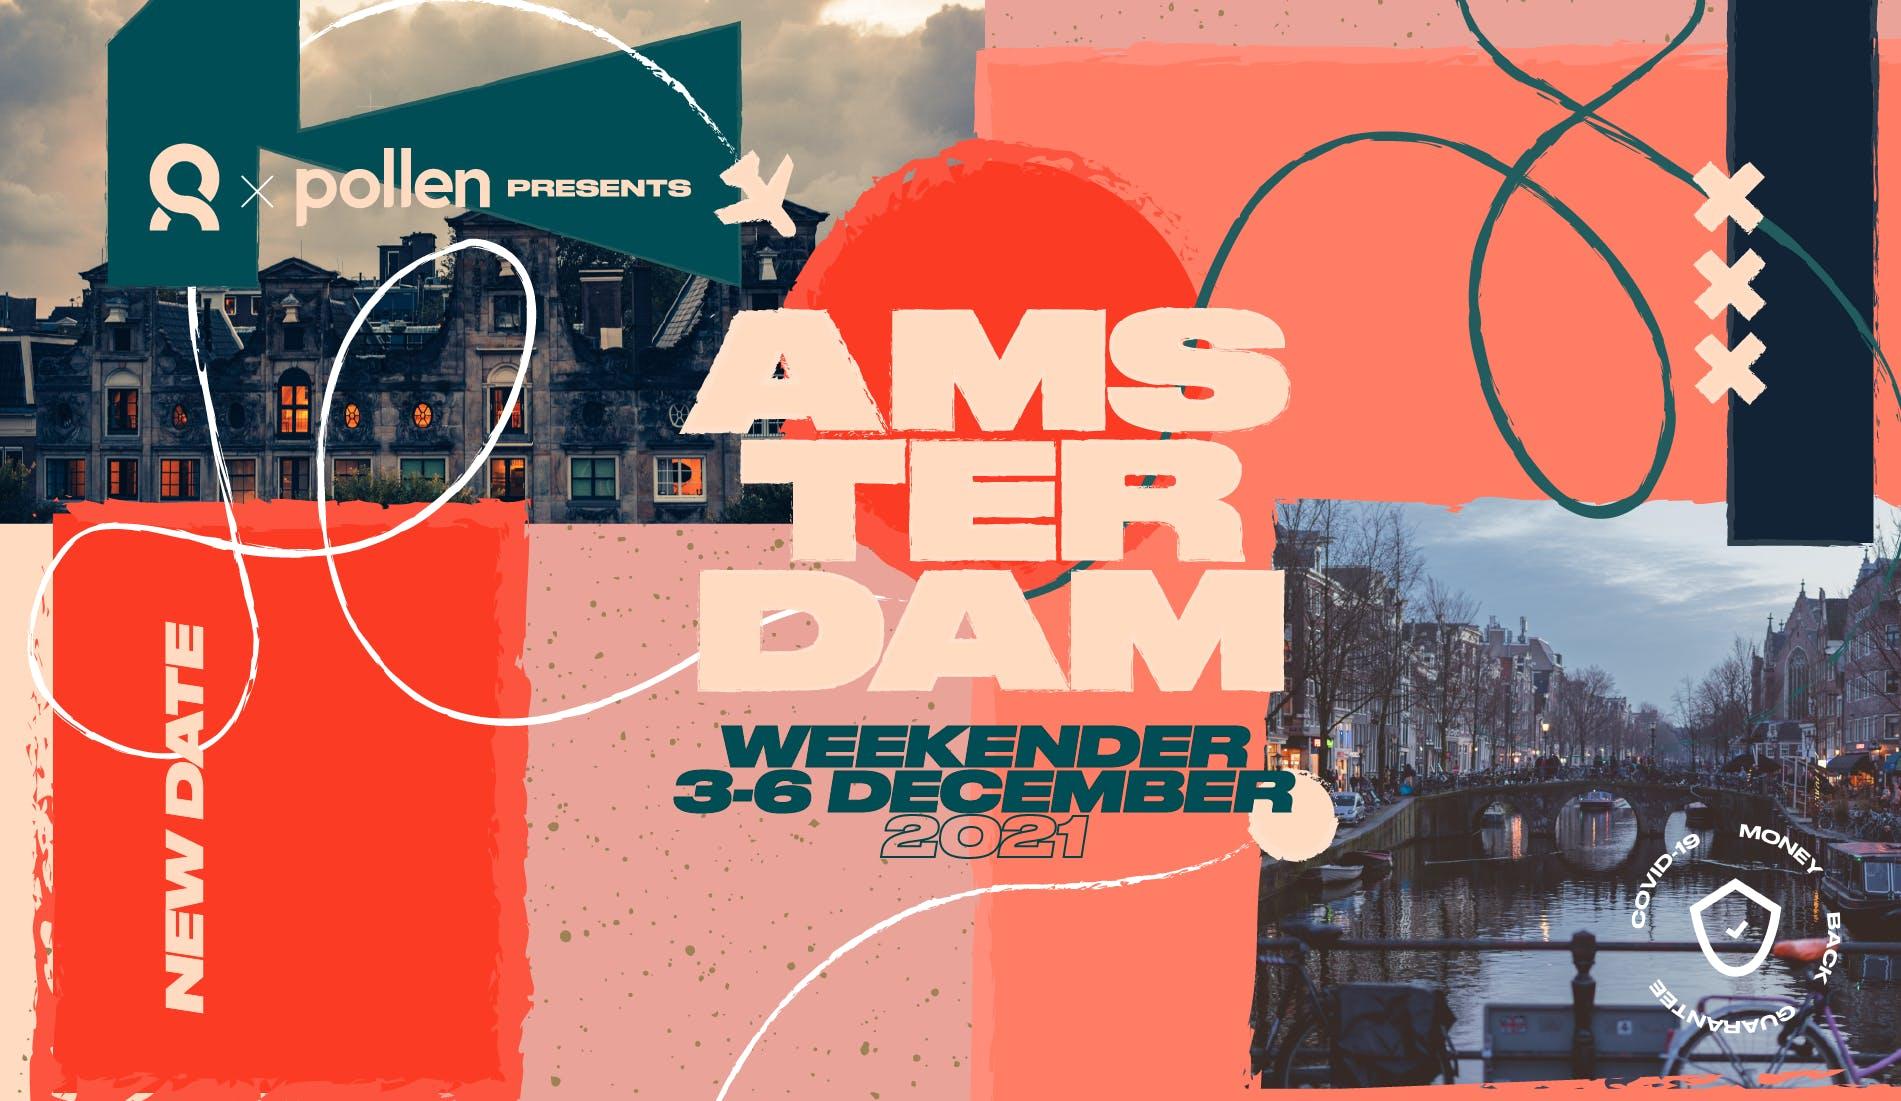 District 8 Amsterdam promo poster